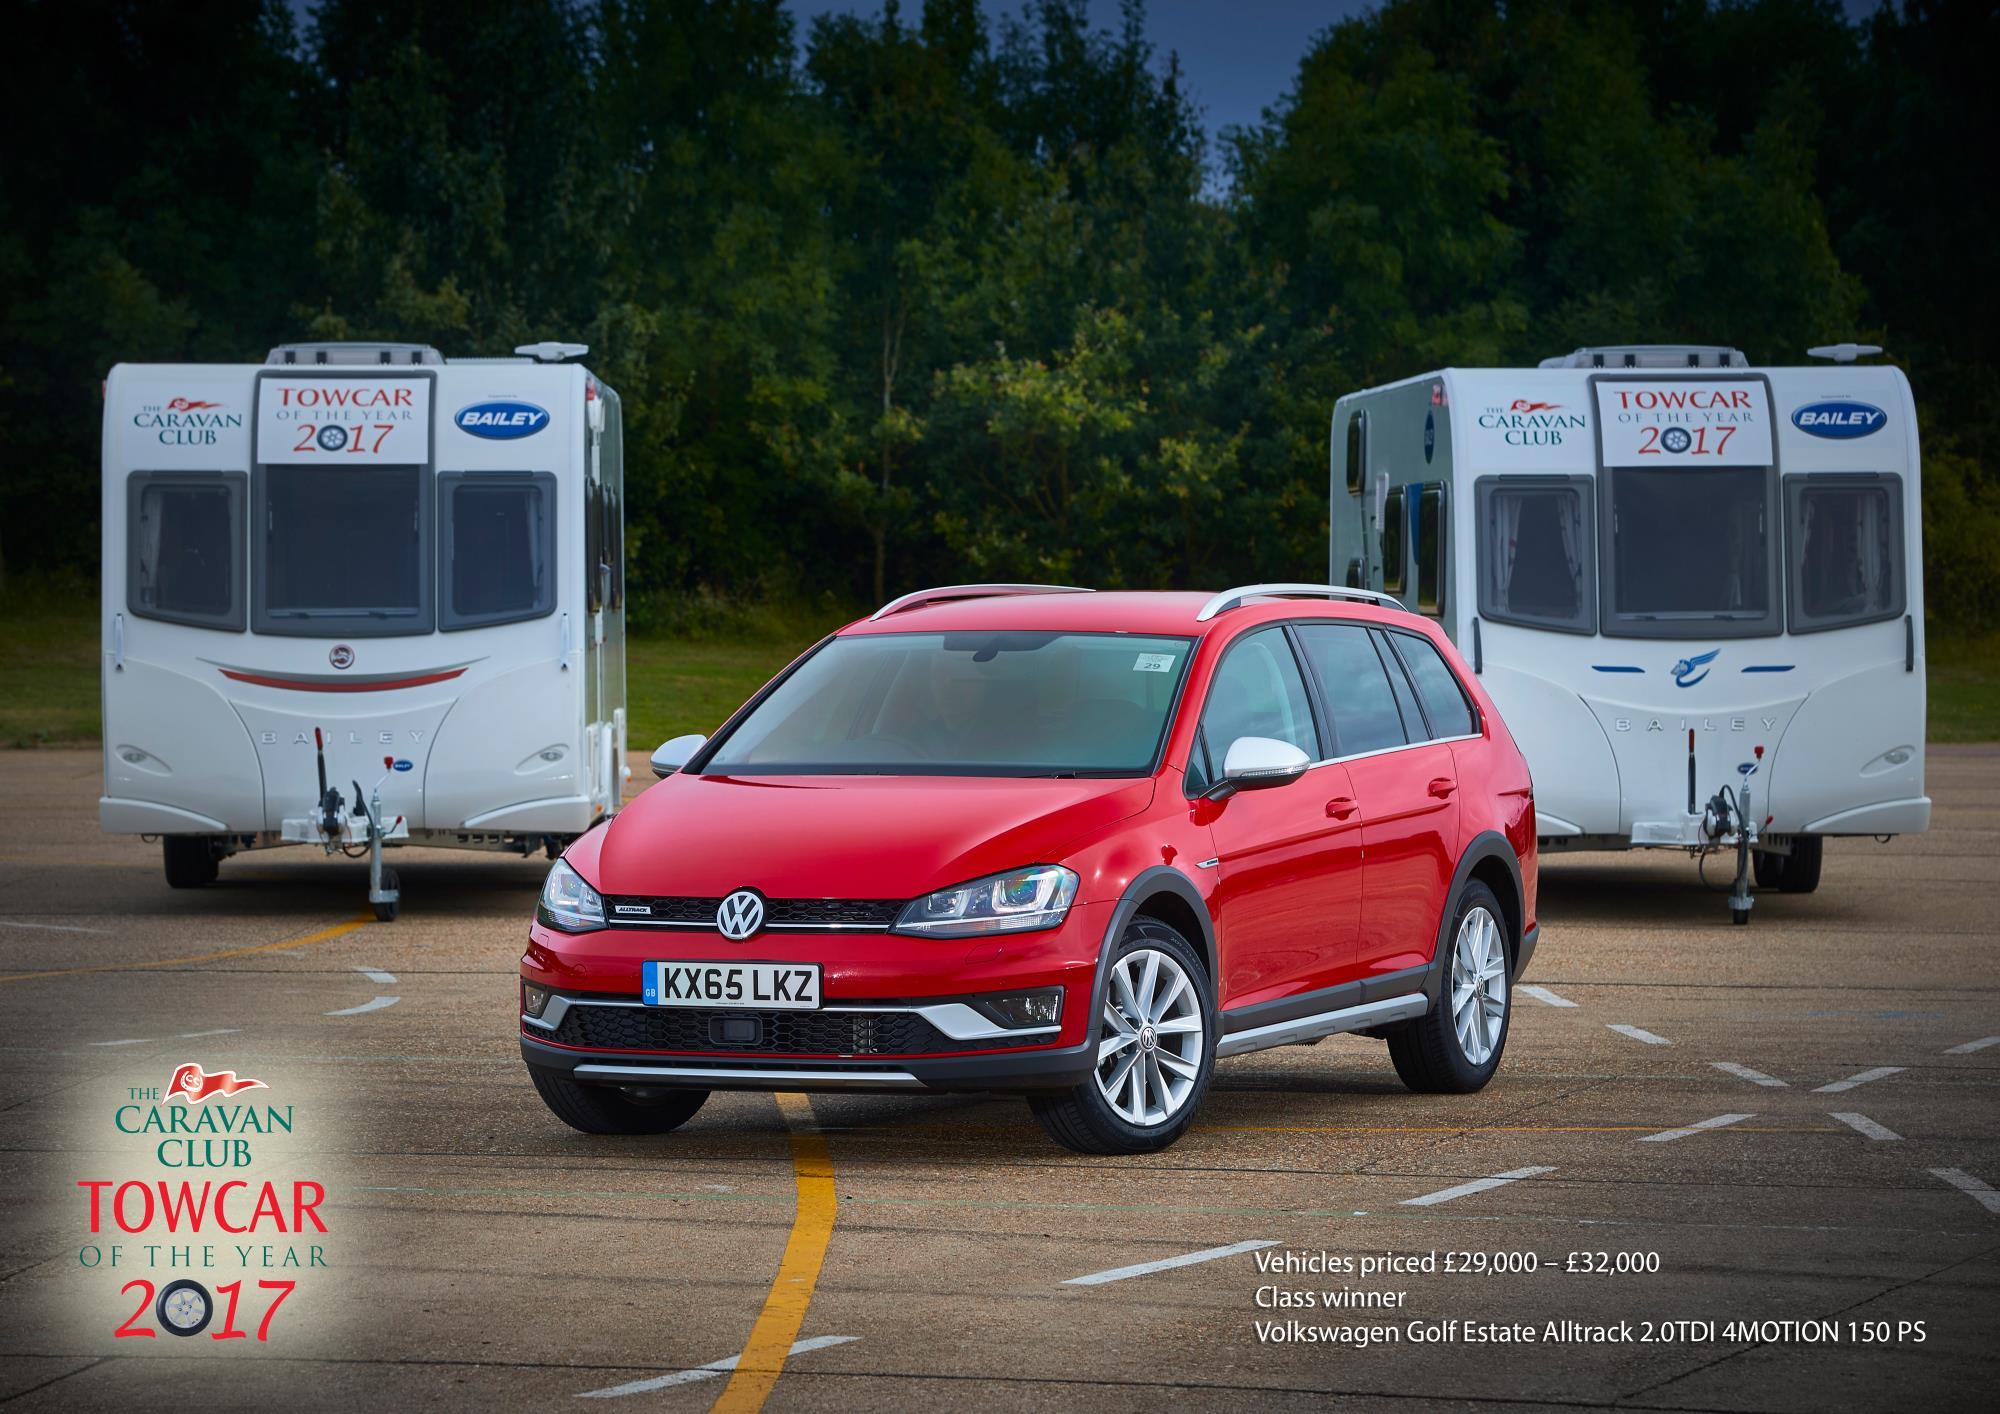 Passat Alltrack is the Caravan Club s Towcar of the Year 2017 VWVortex